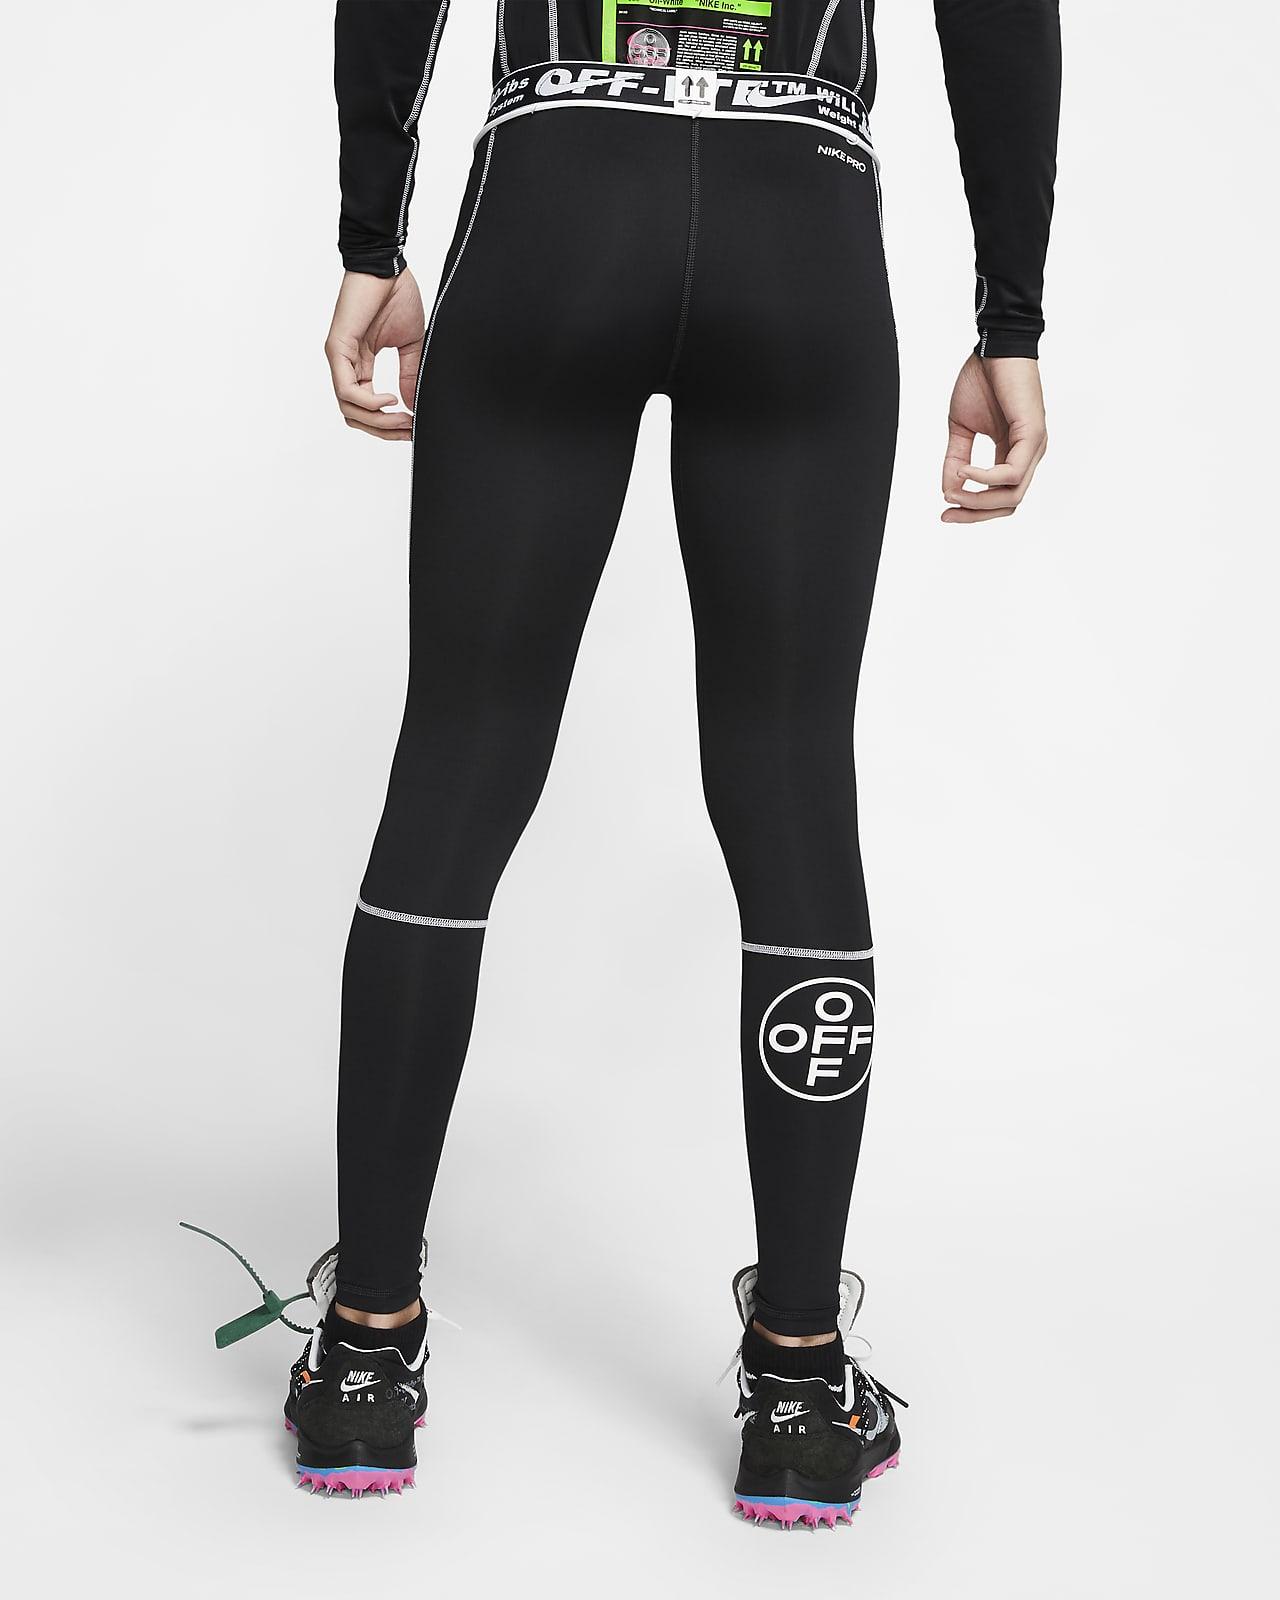 Off-White™ Pro Men's Tights. Nike SG